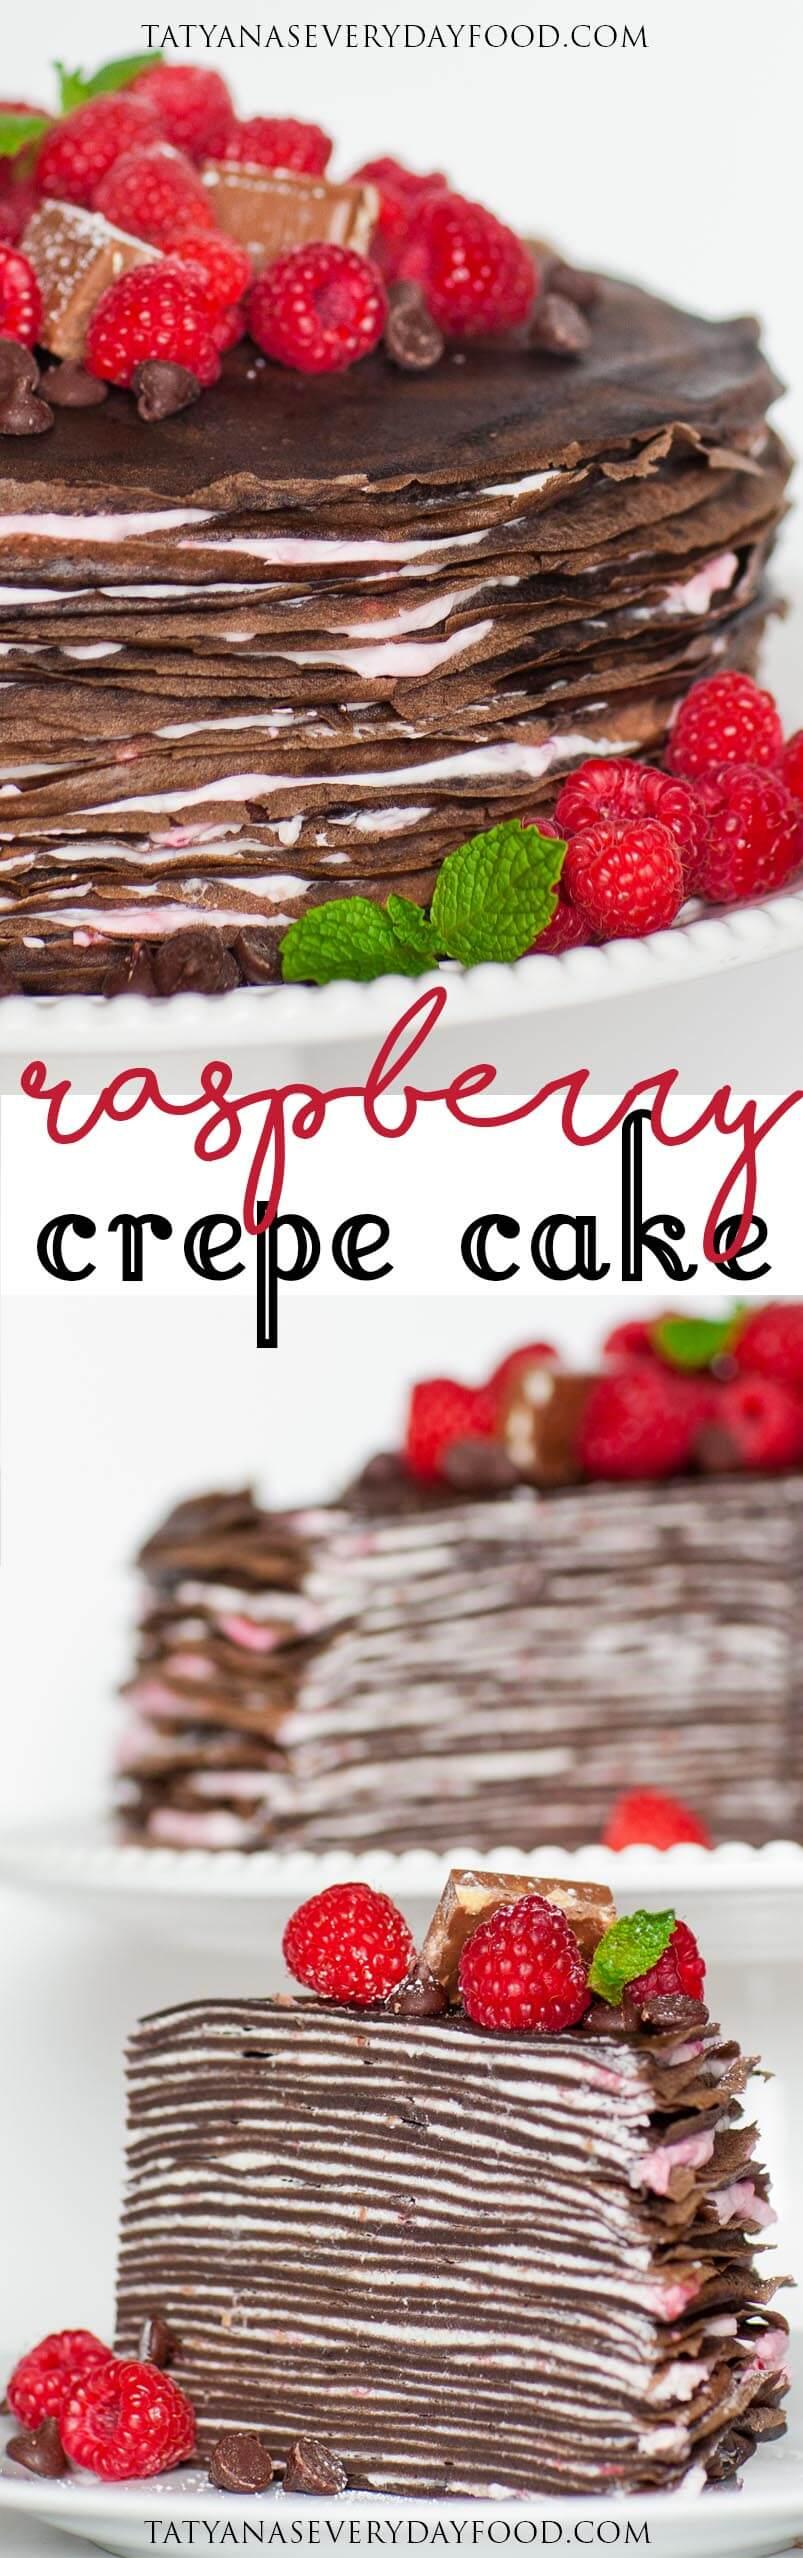 Chocolate Raspberry Crepe Cake recipe with video